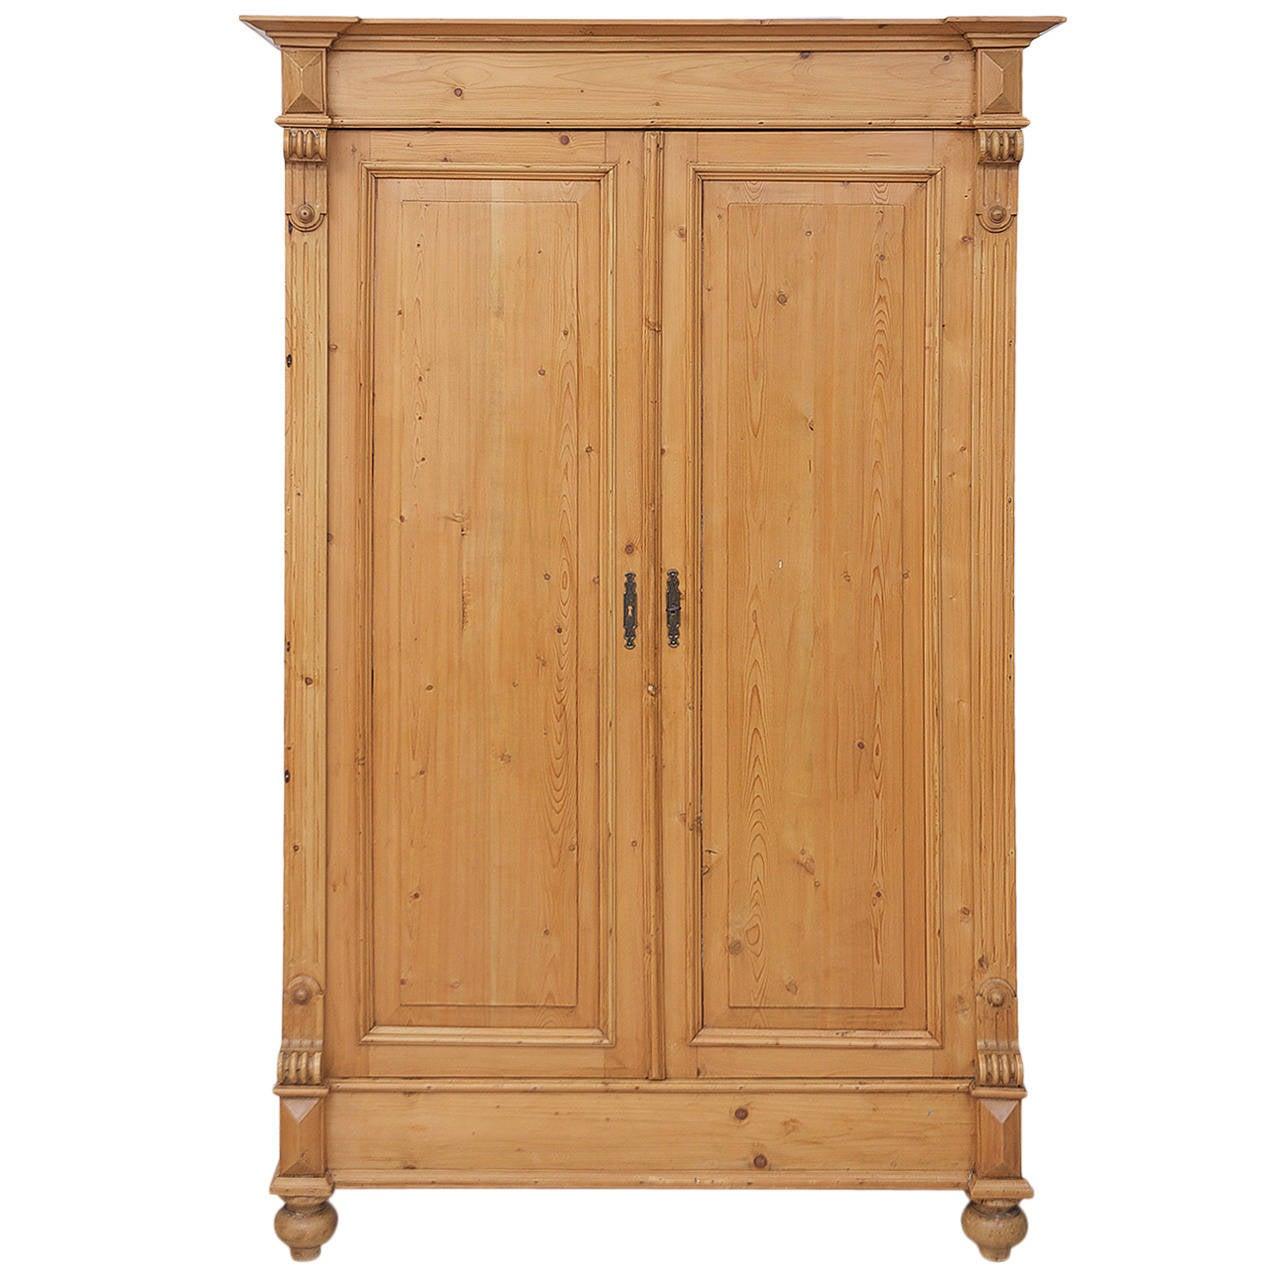 german19th century gr nderzeit pine armoire at 1stdibs. Black Bedroom Furniture Sets. Home Design Ideas